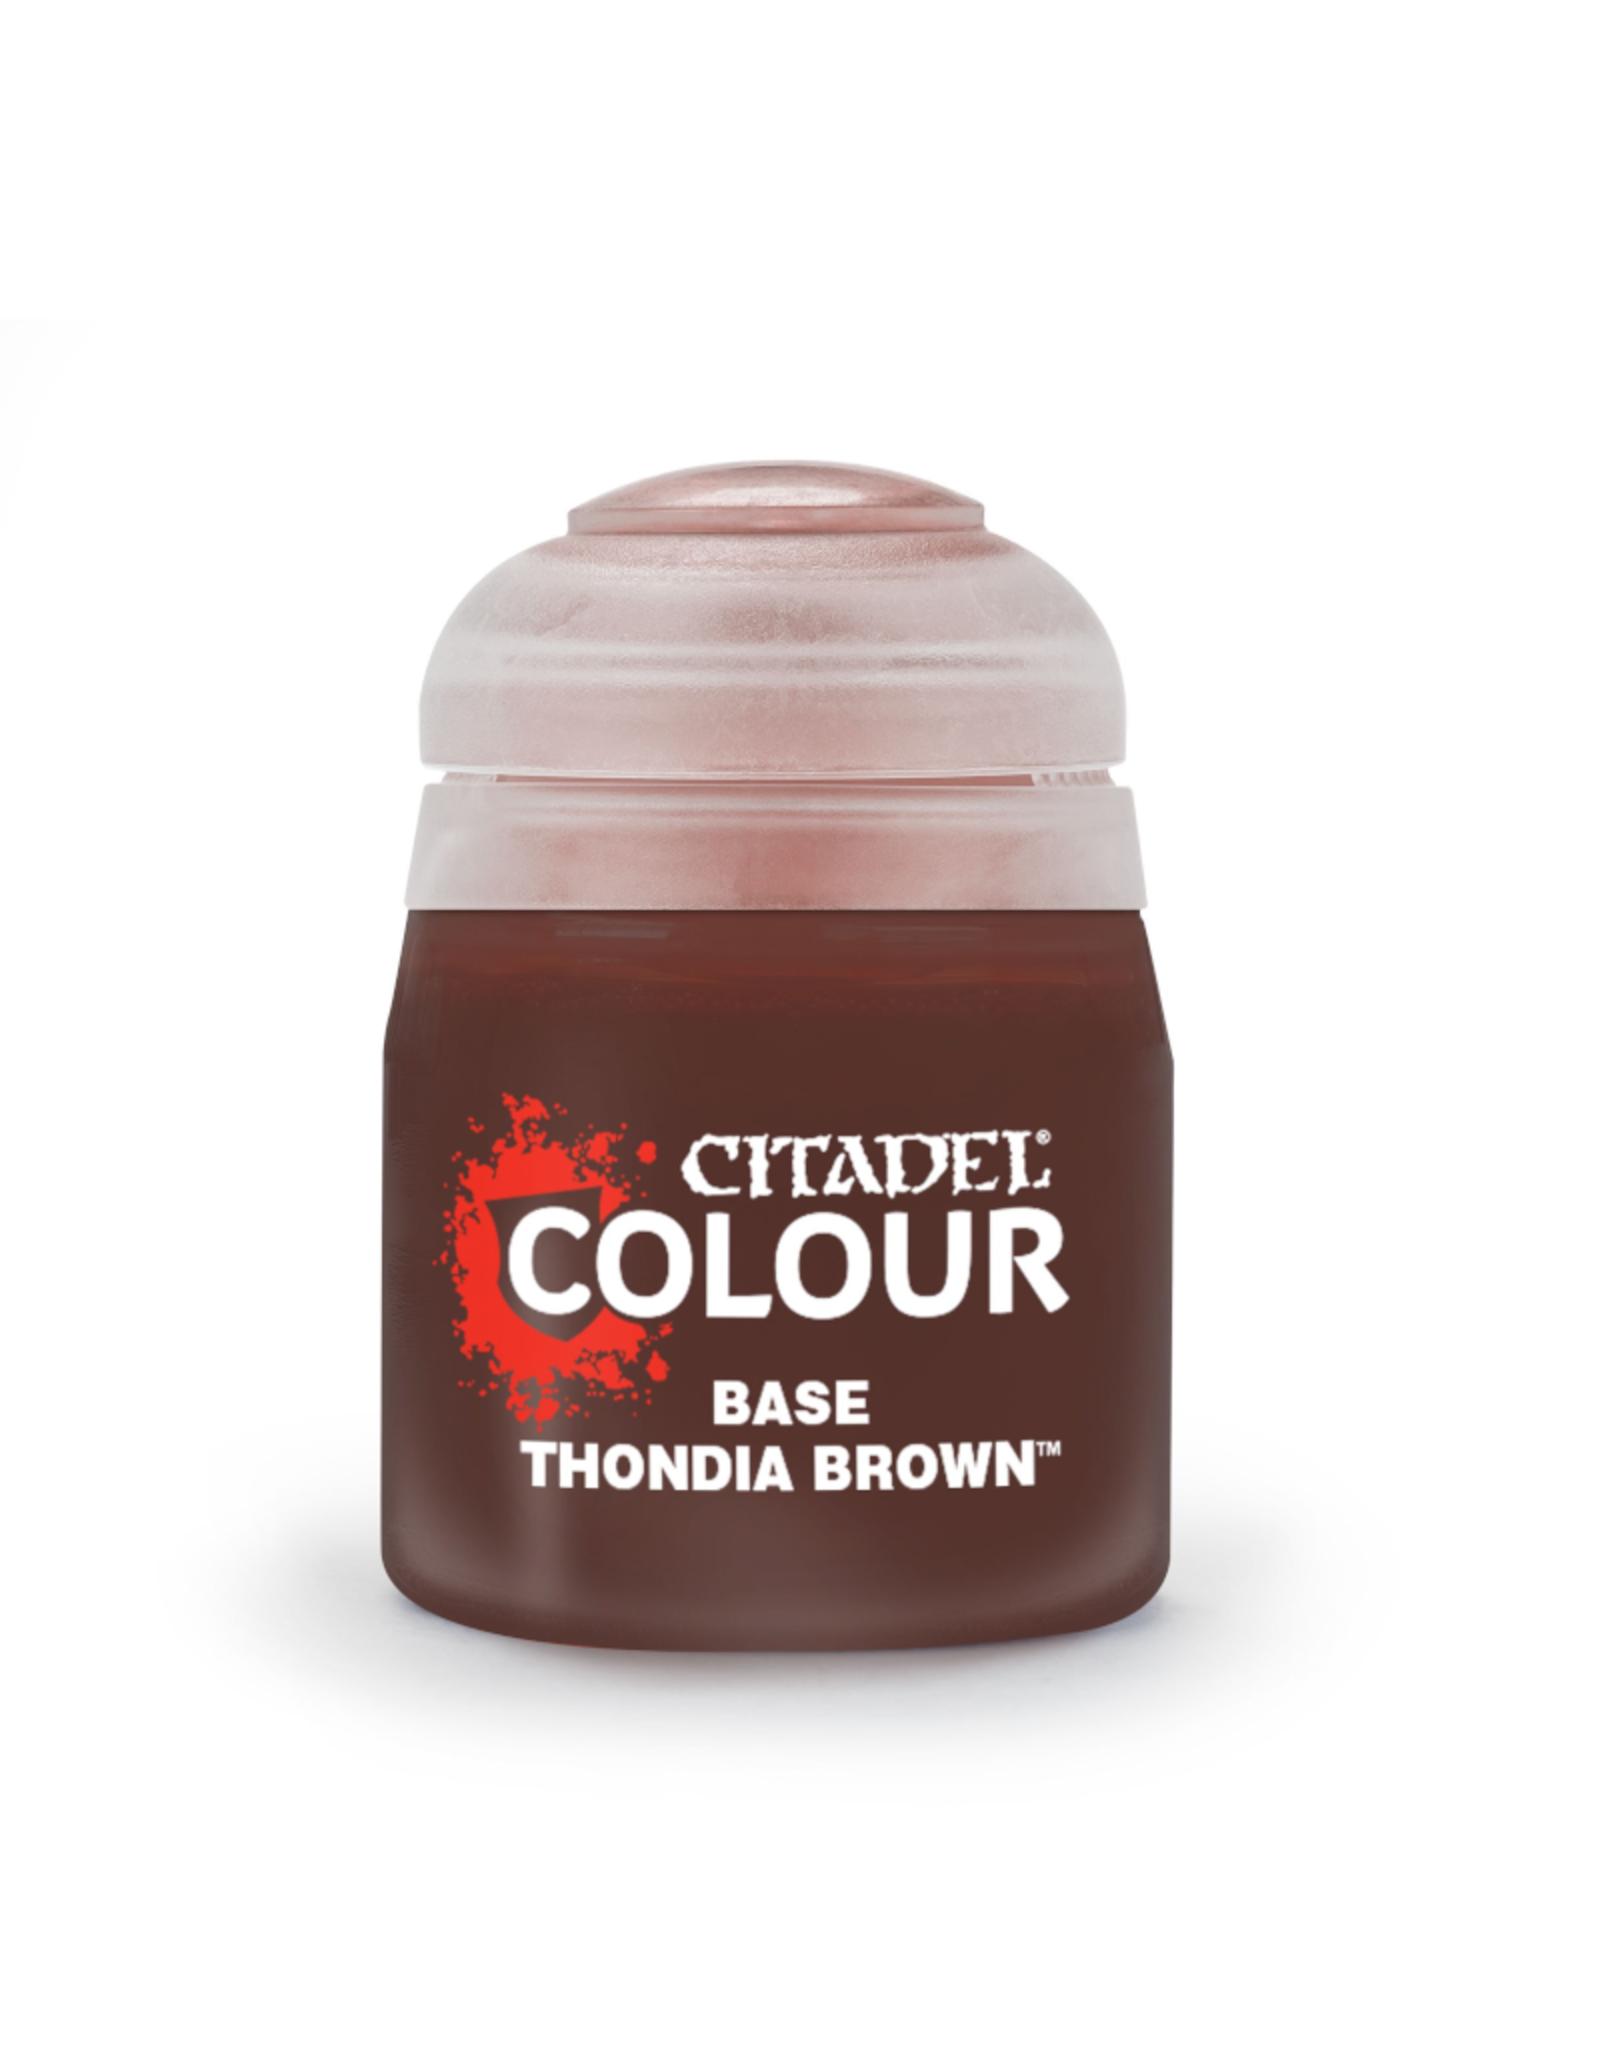 Citadel Base Paint: Thondia Brown